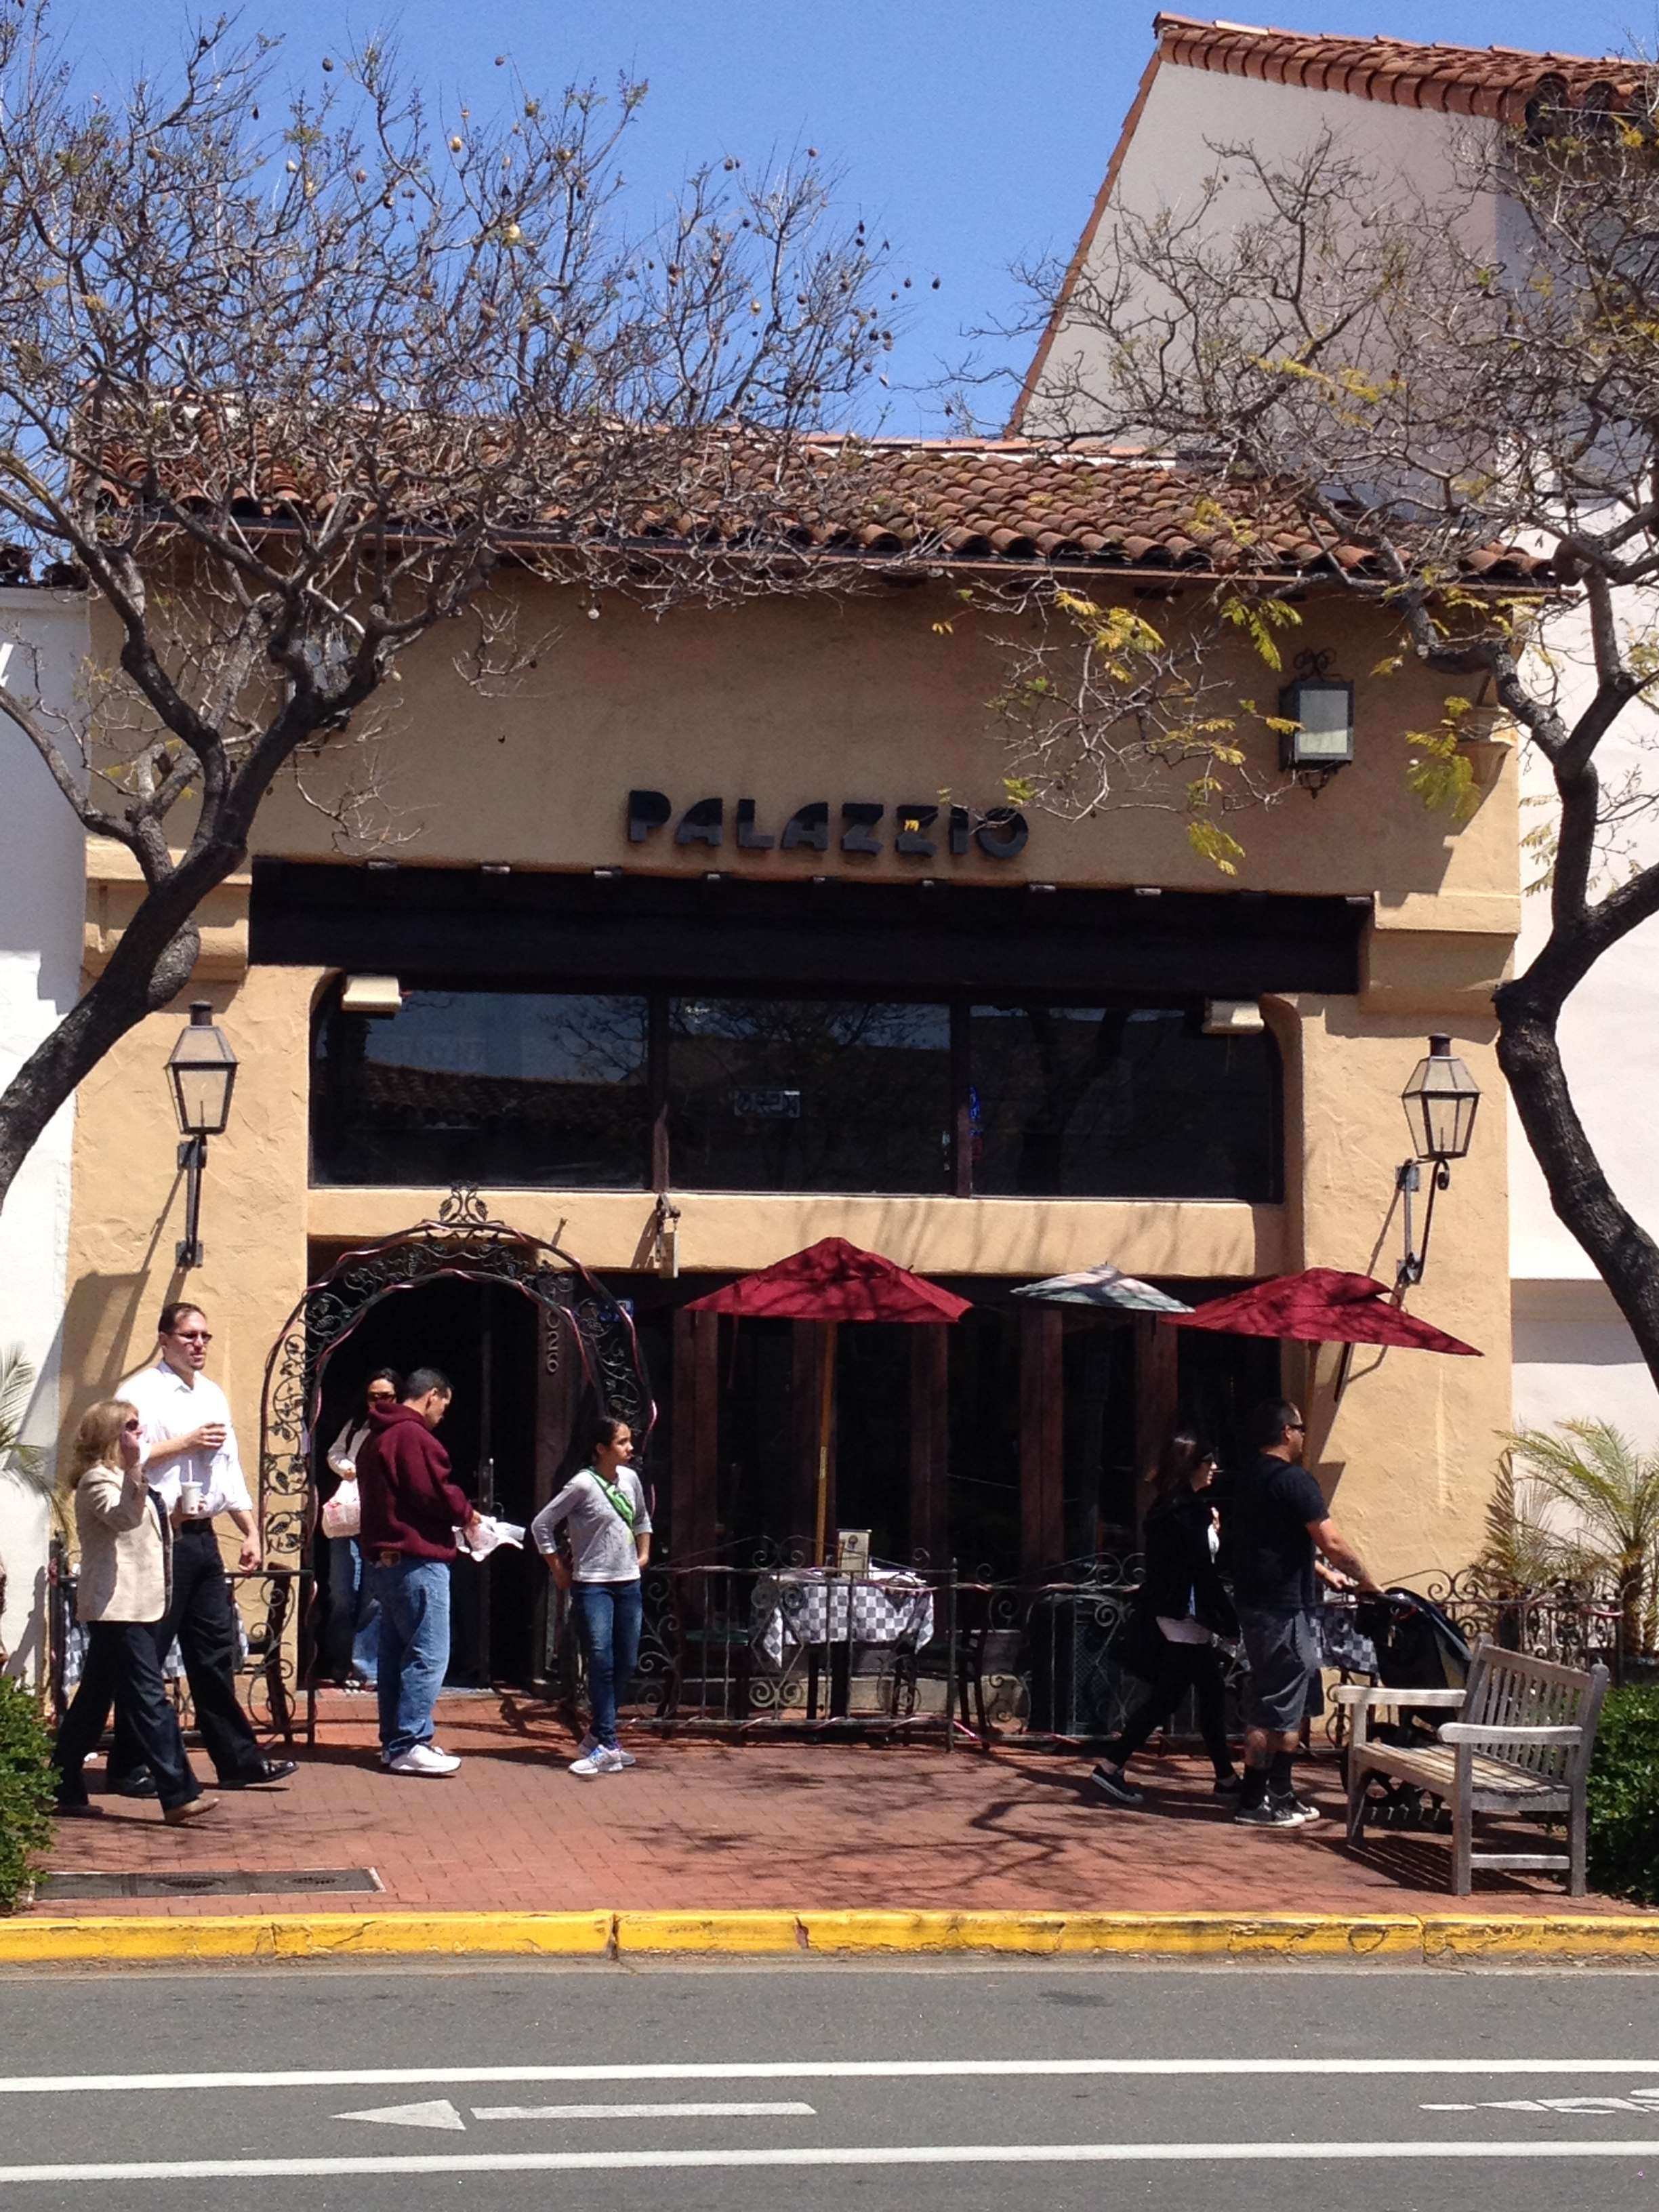 Palazzio, Santa Barbara CA